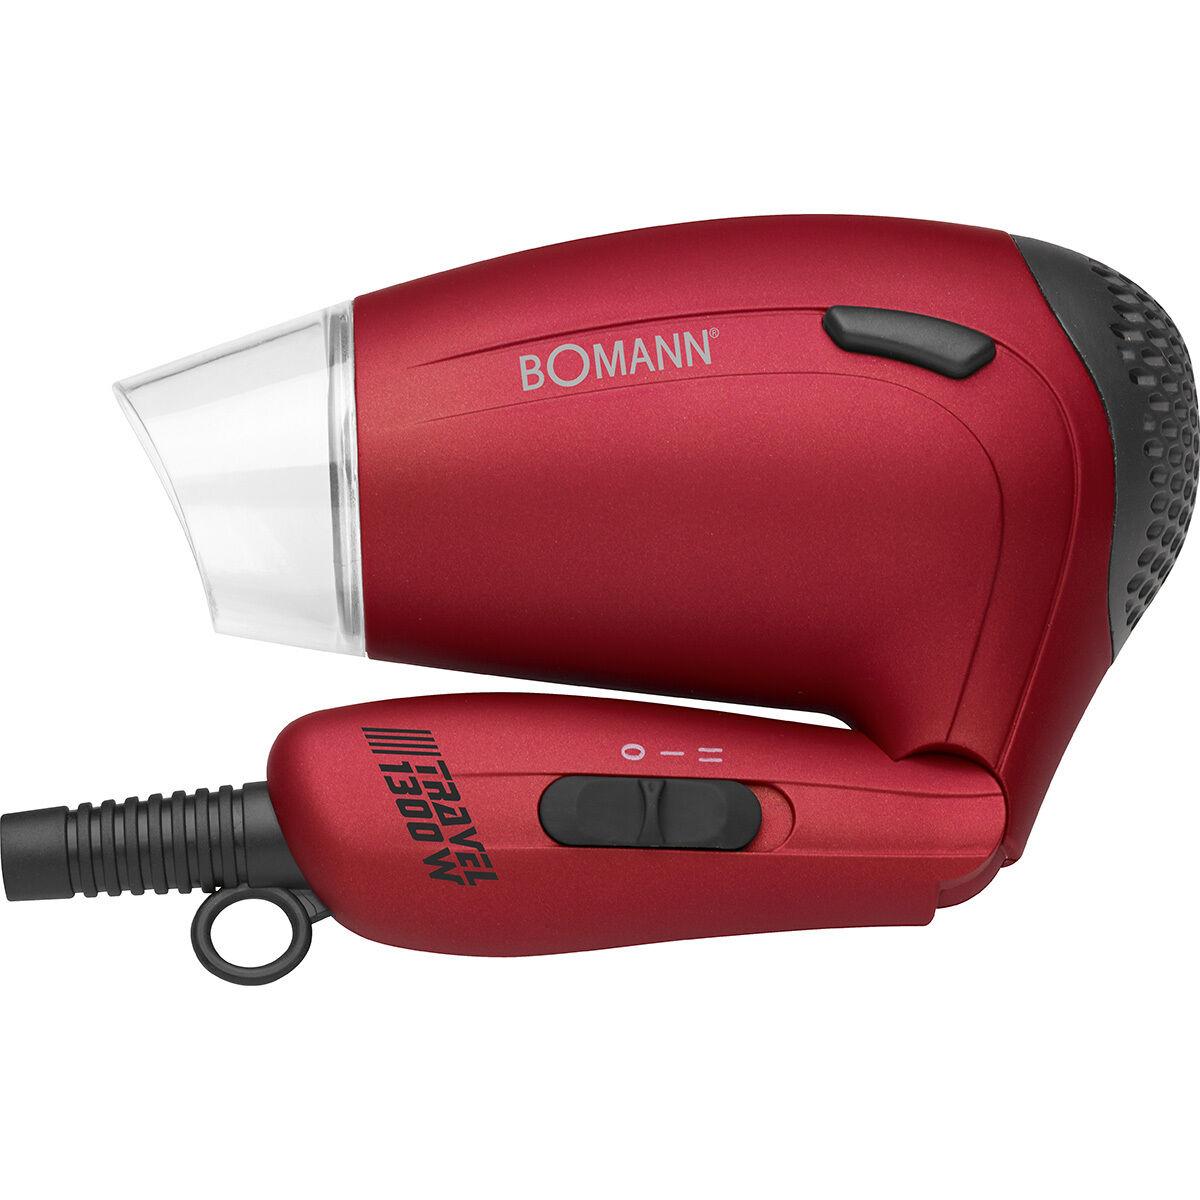 Bomann HTD8005 - Secador de pelo de viaje con difusor, mango plegable,...